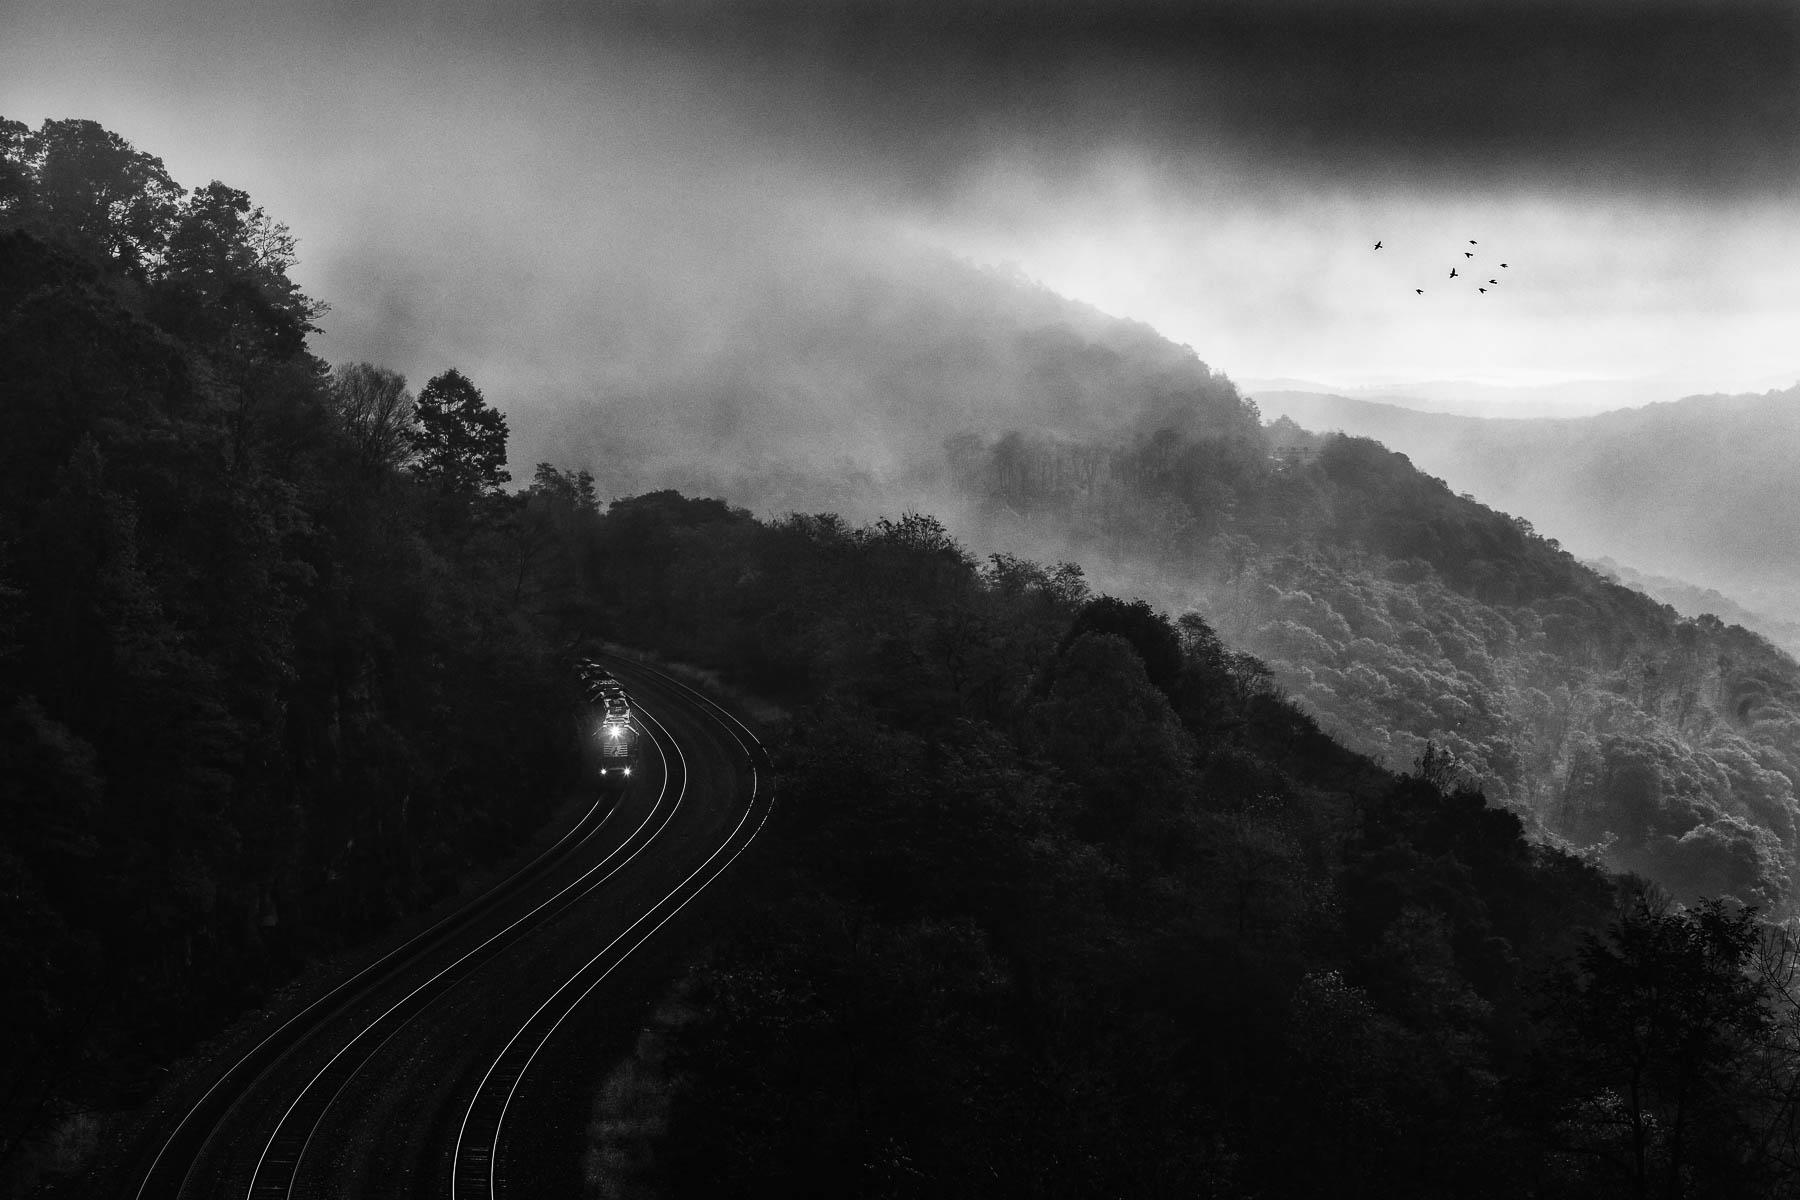 Eric_Williams_Conduits of Steel_The Alleghany Ridge_6.jpg